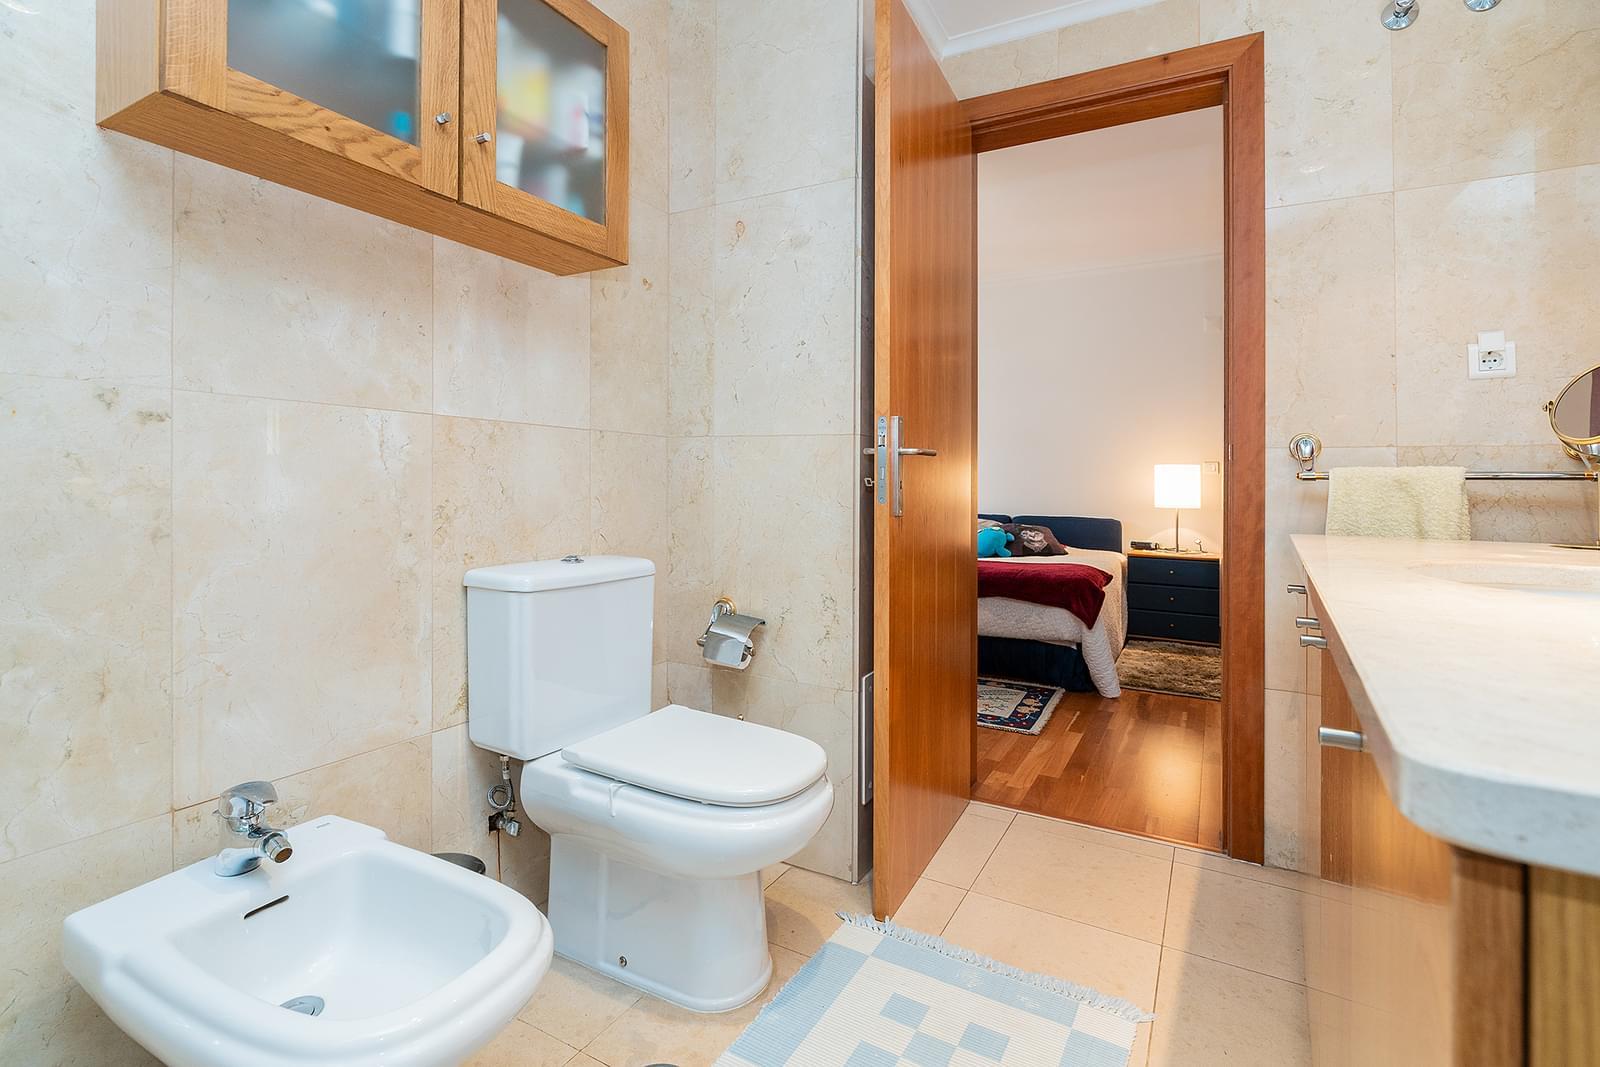 pf18049-apartamento-t3-lisboa-266b0caa-61fc-4206-8f5f-4d13b84f9cbc